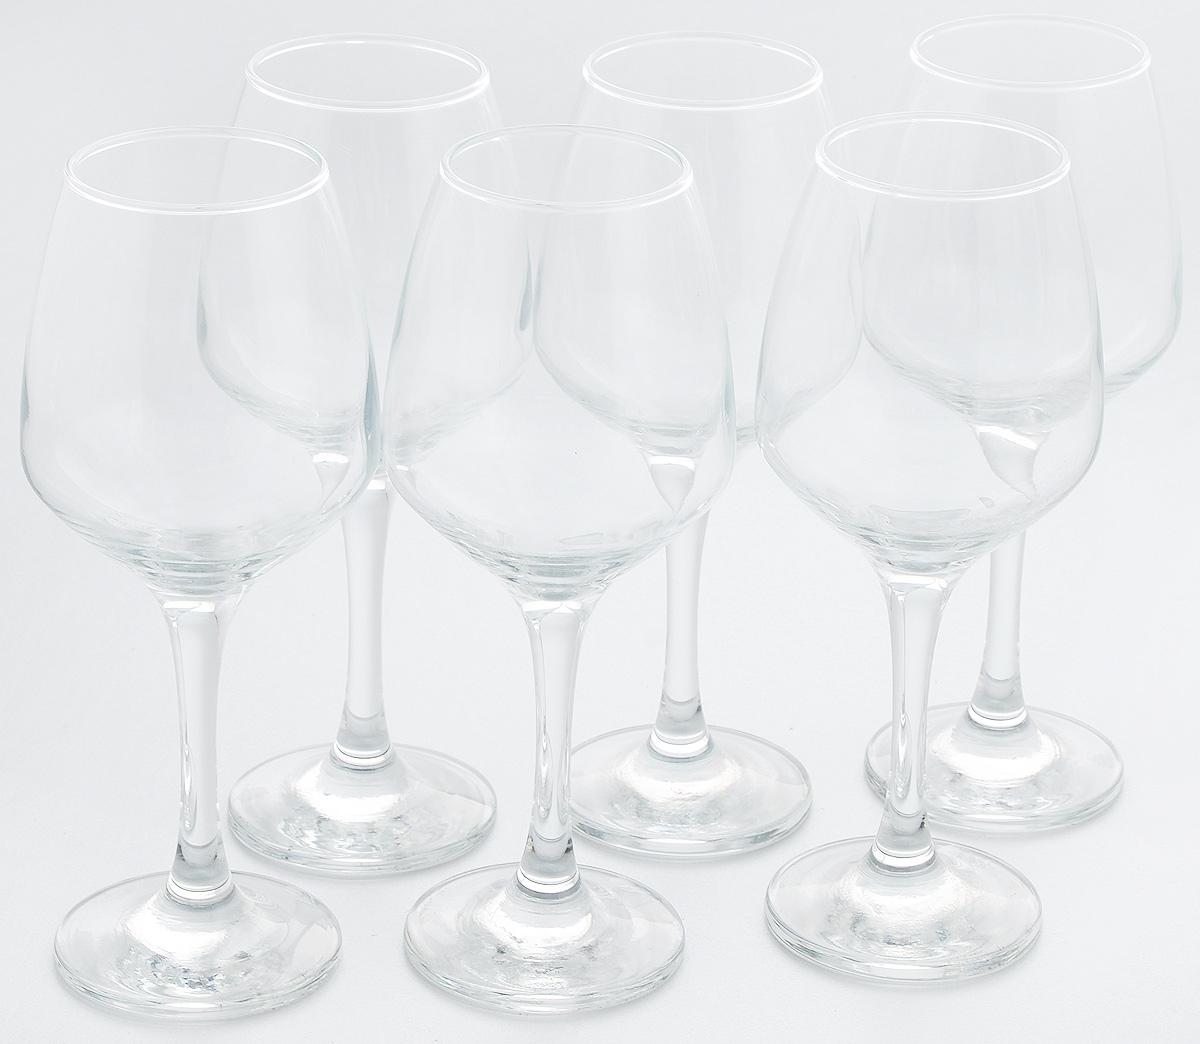 Набор бокалов для вина Pasabahce Isabella, 350 мл, 6 шт набор бокалов pasabahce isabella 65 мл 6 шт